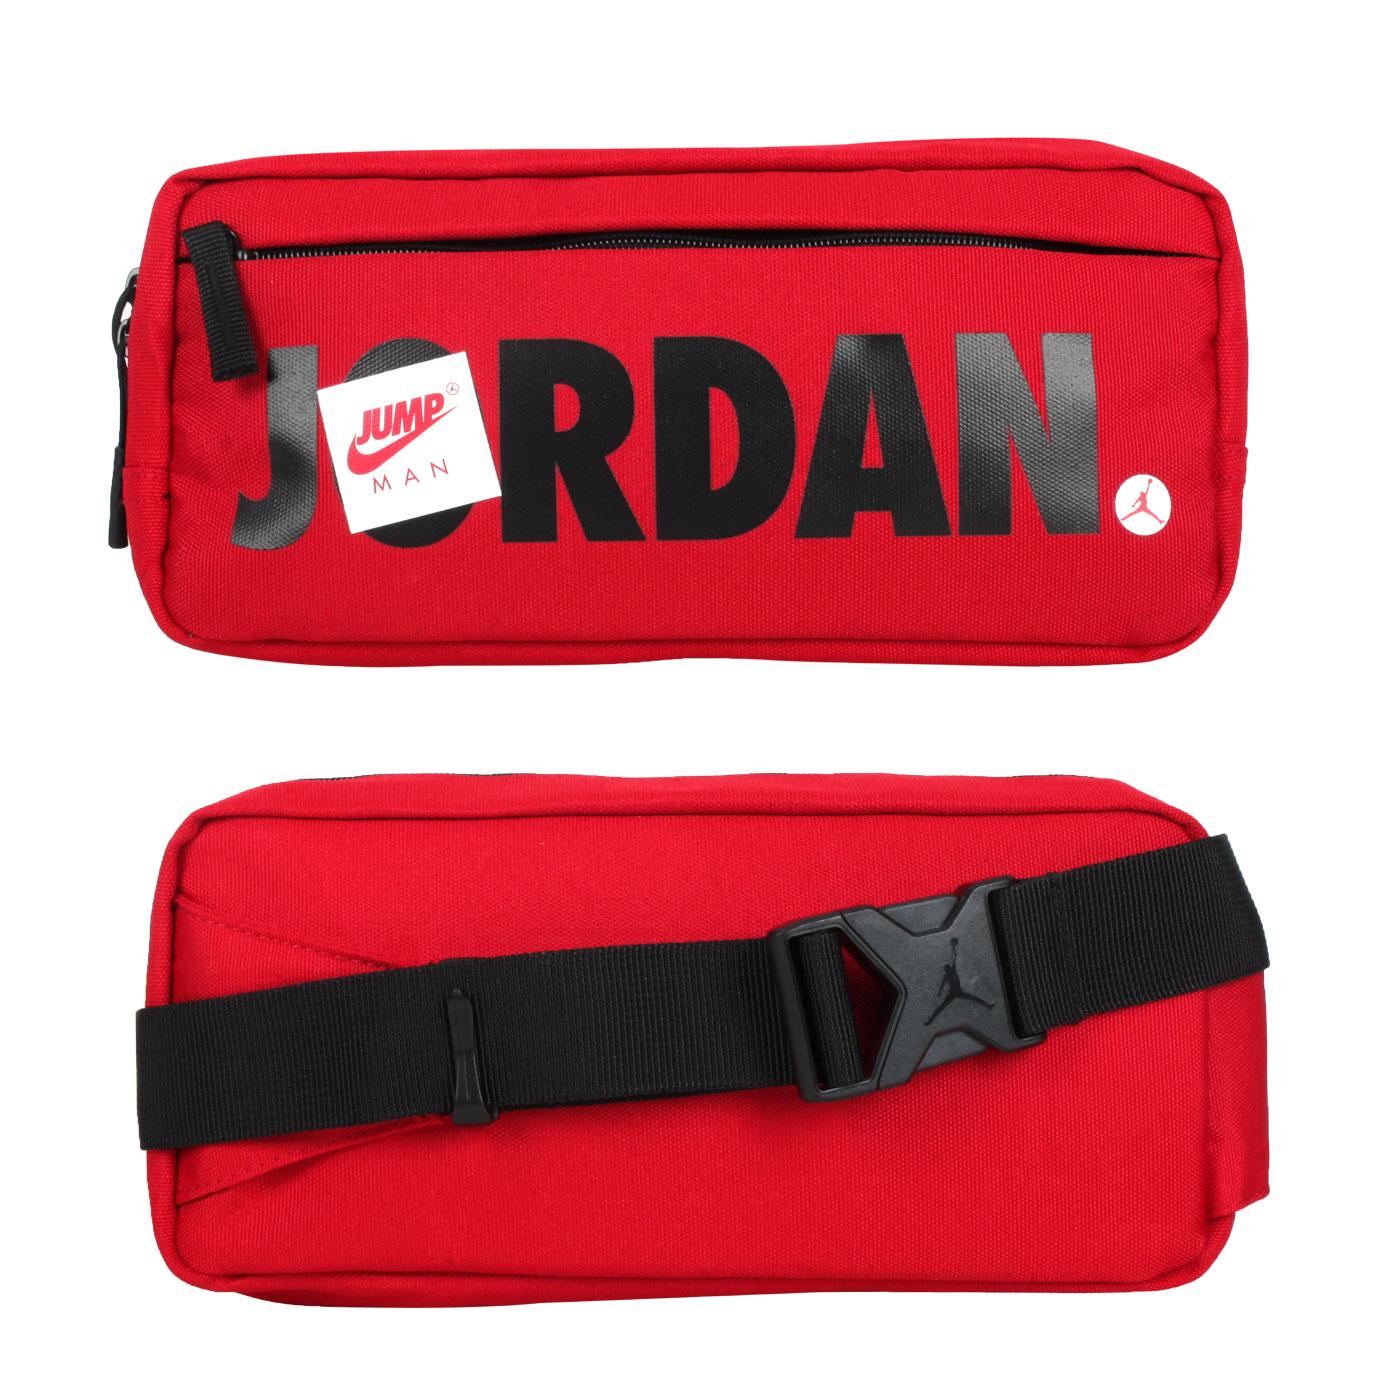 NIKE JORDAN 中型腰包 JD2113015AD-002 - 紅黑白